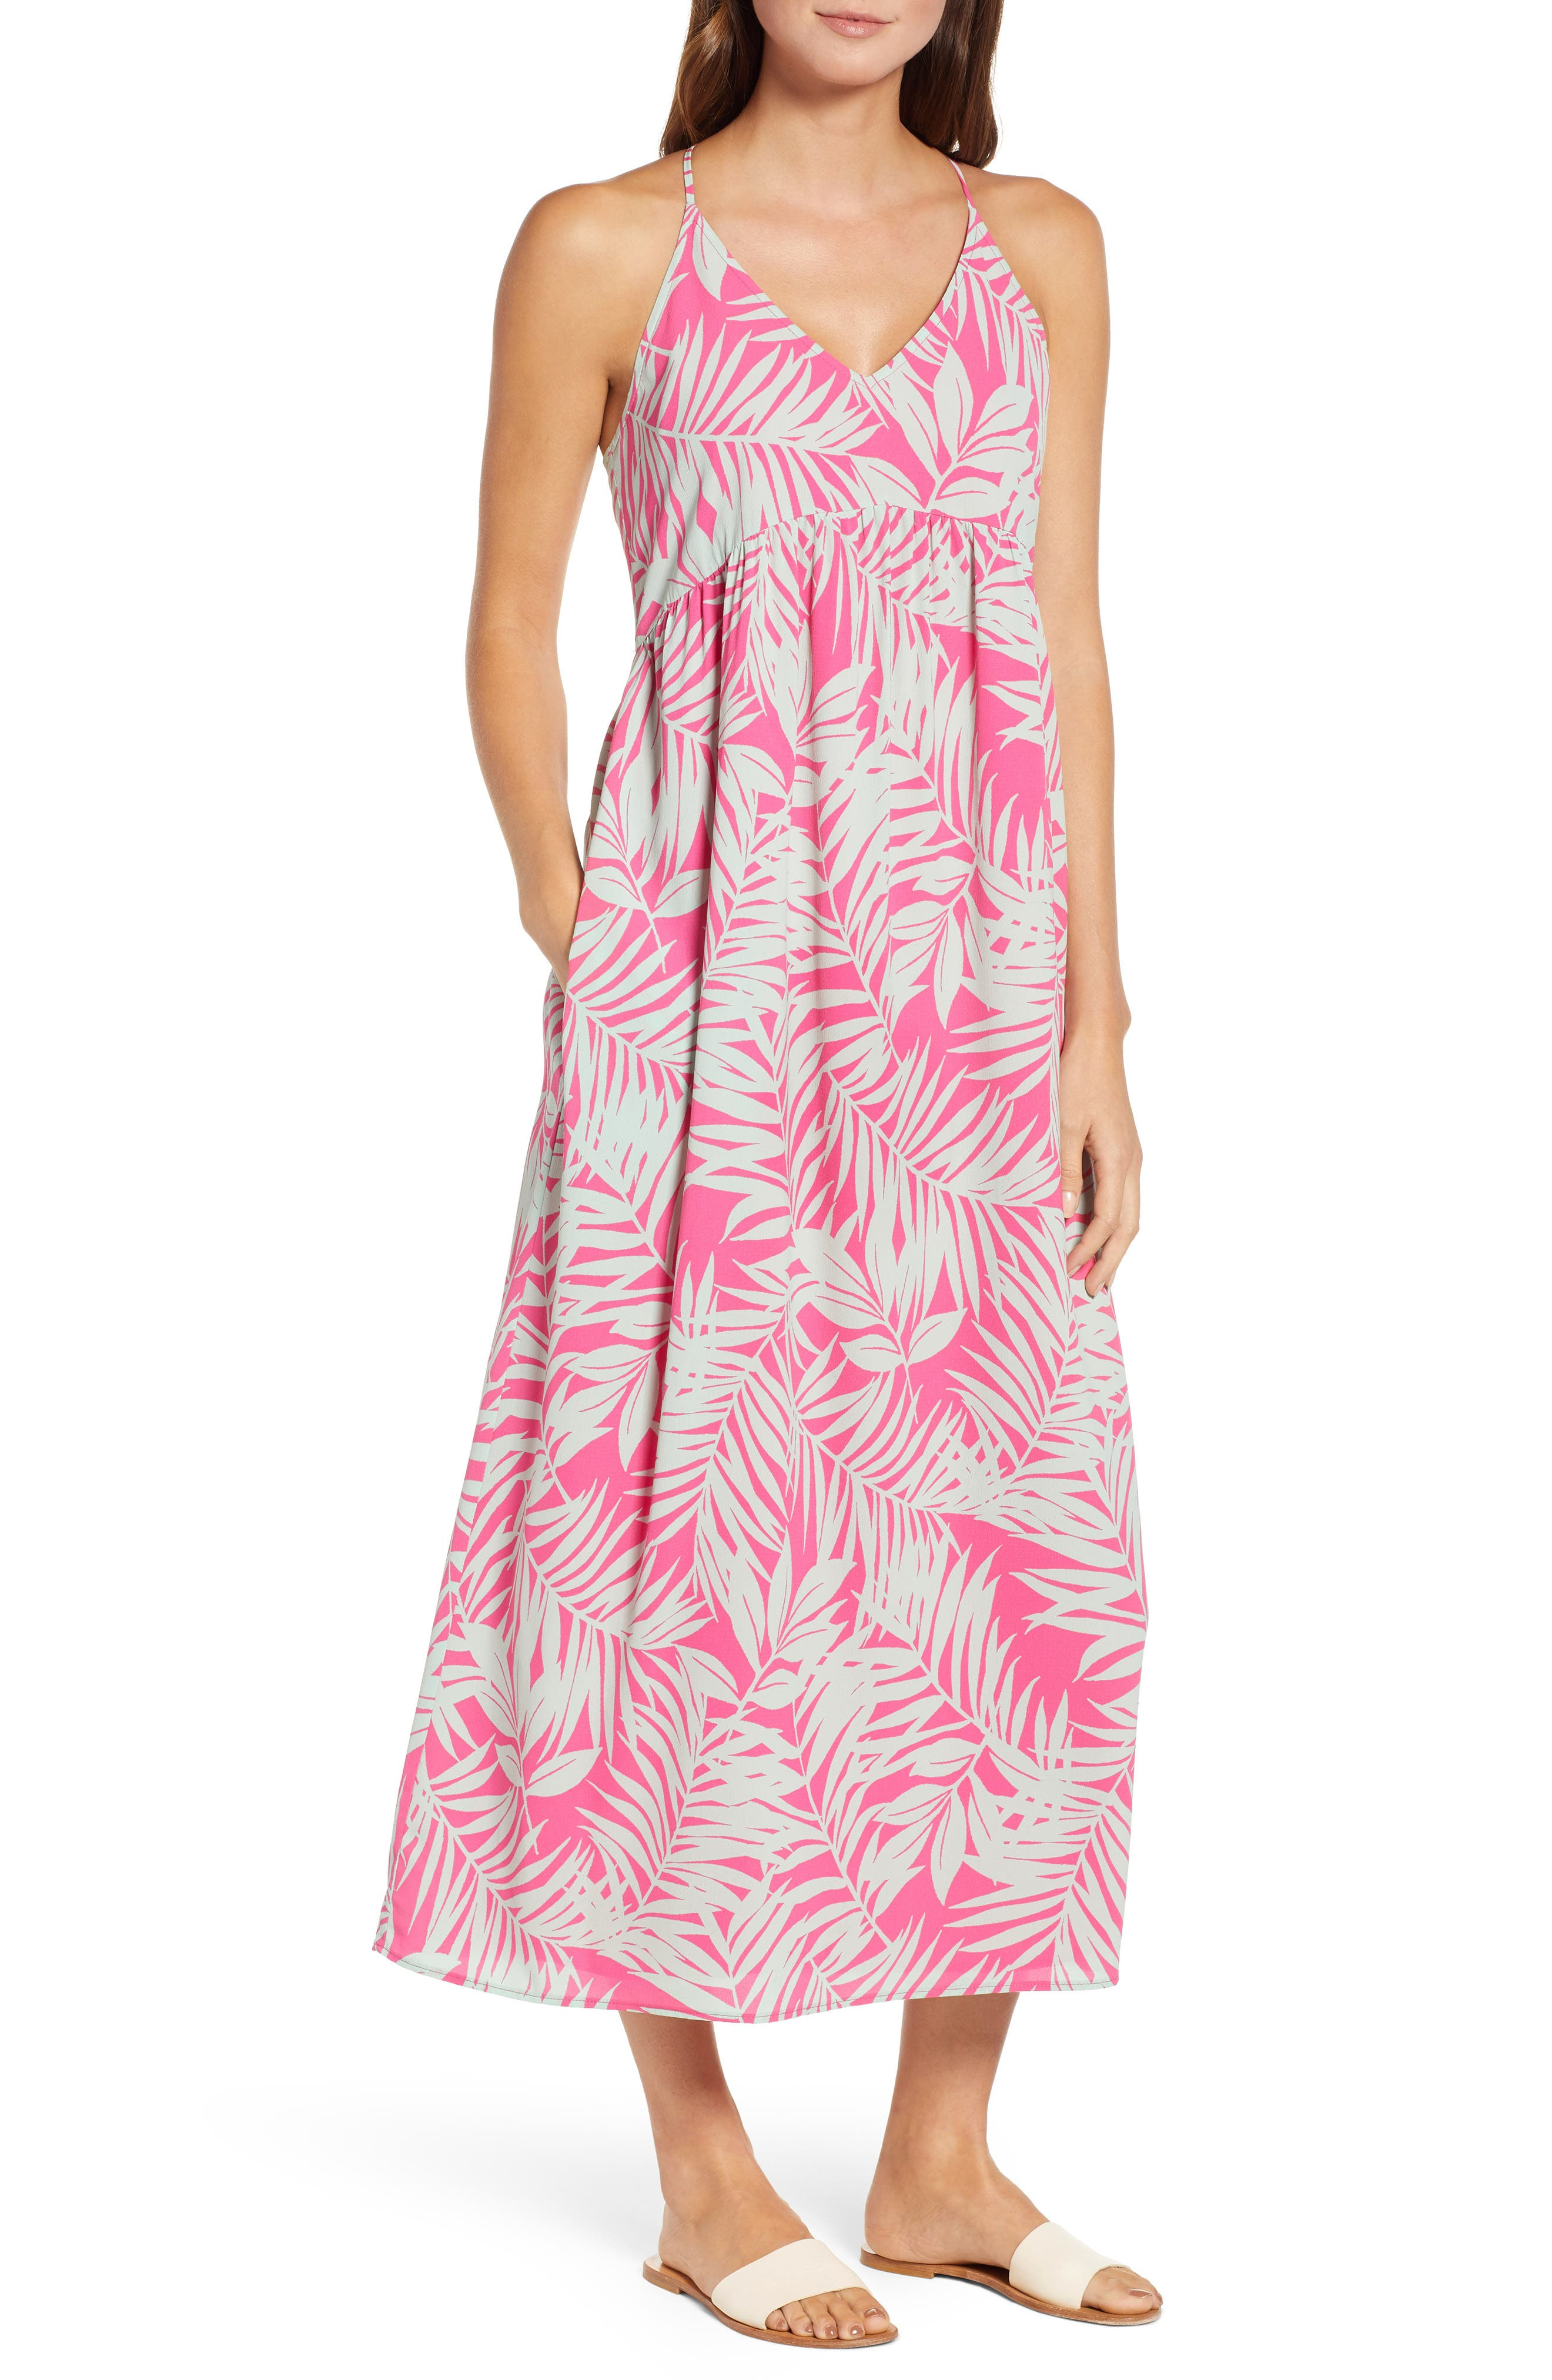 Petite Gibson X Hi Sugarplum! Palm Springs Festival Maxi Dress, Pink